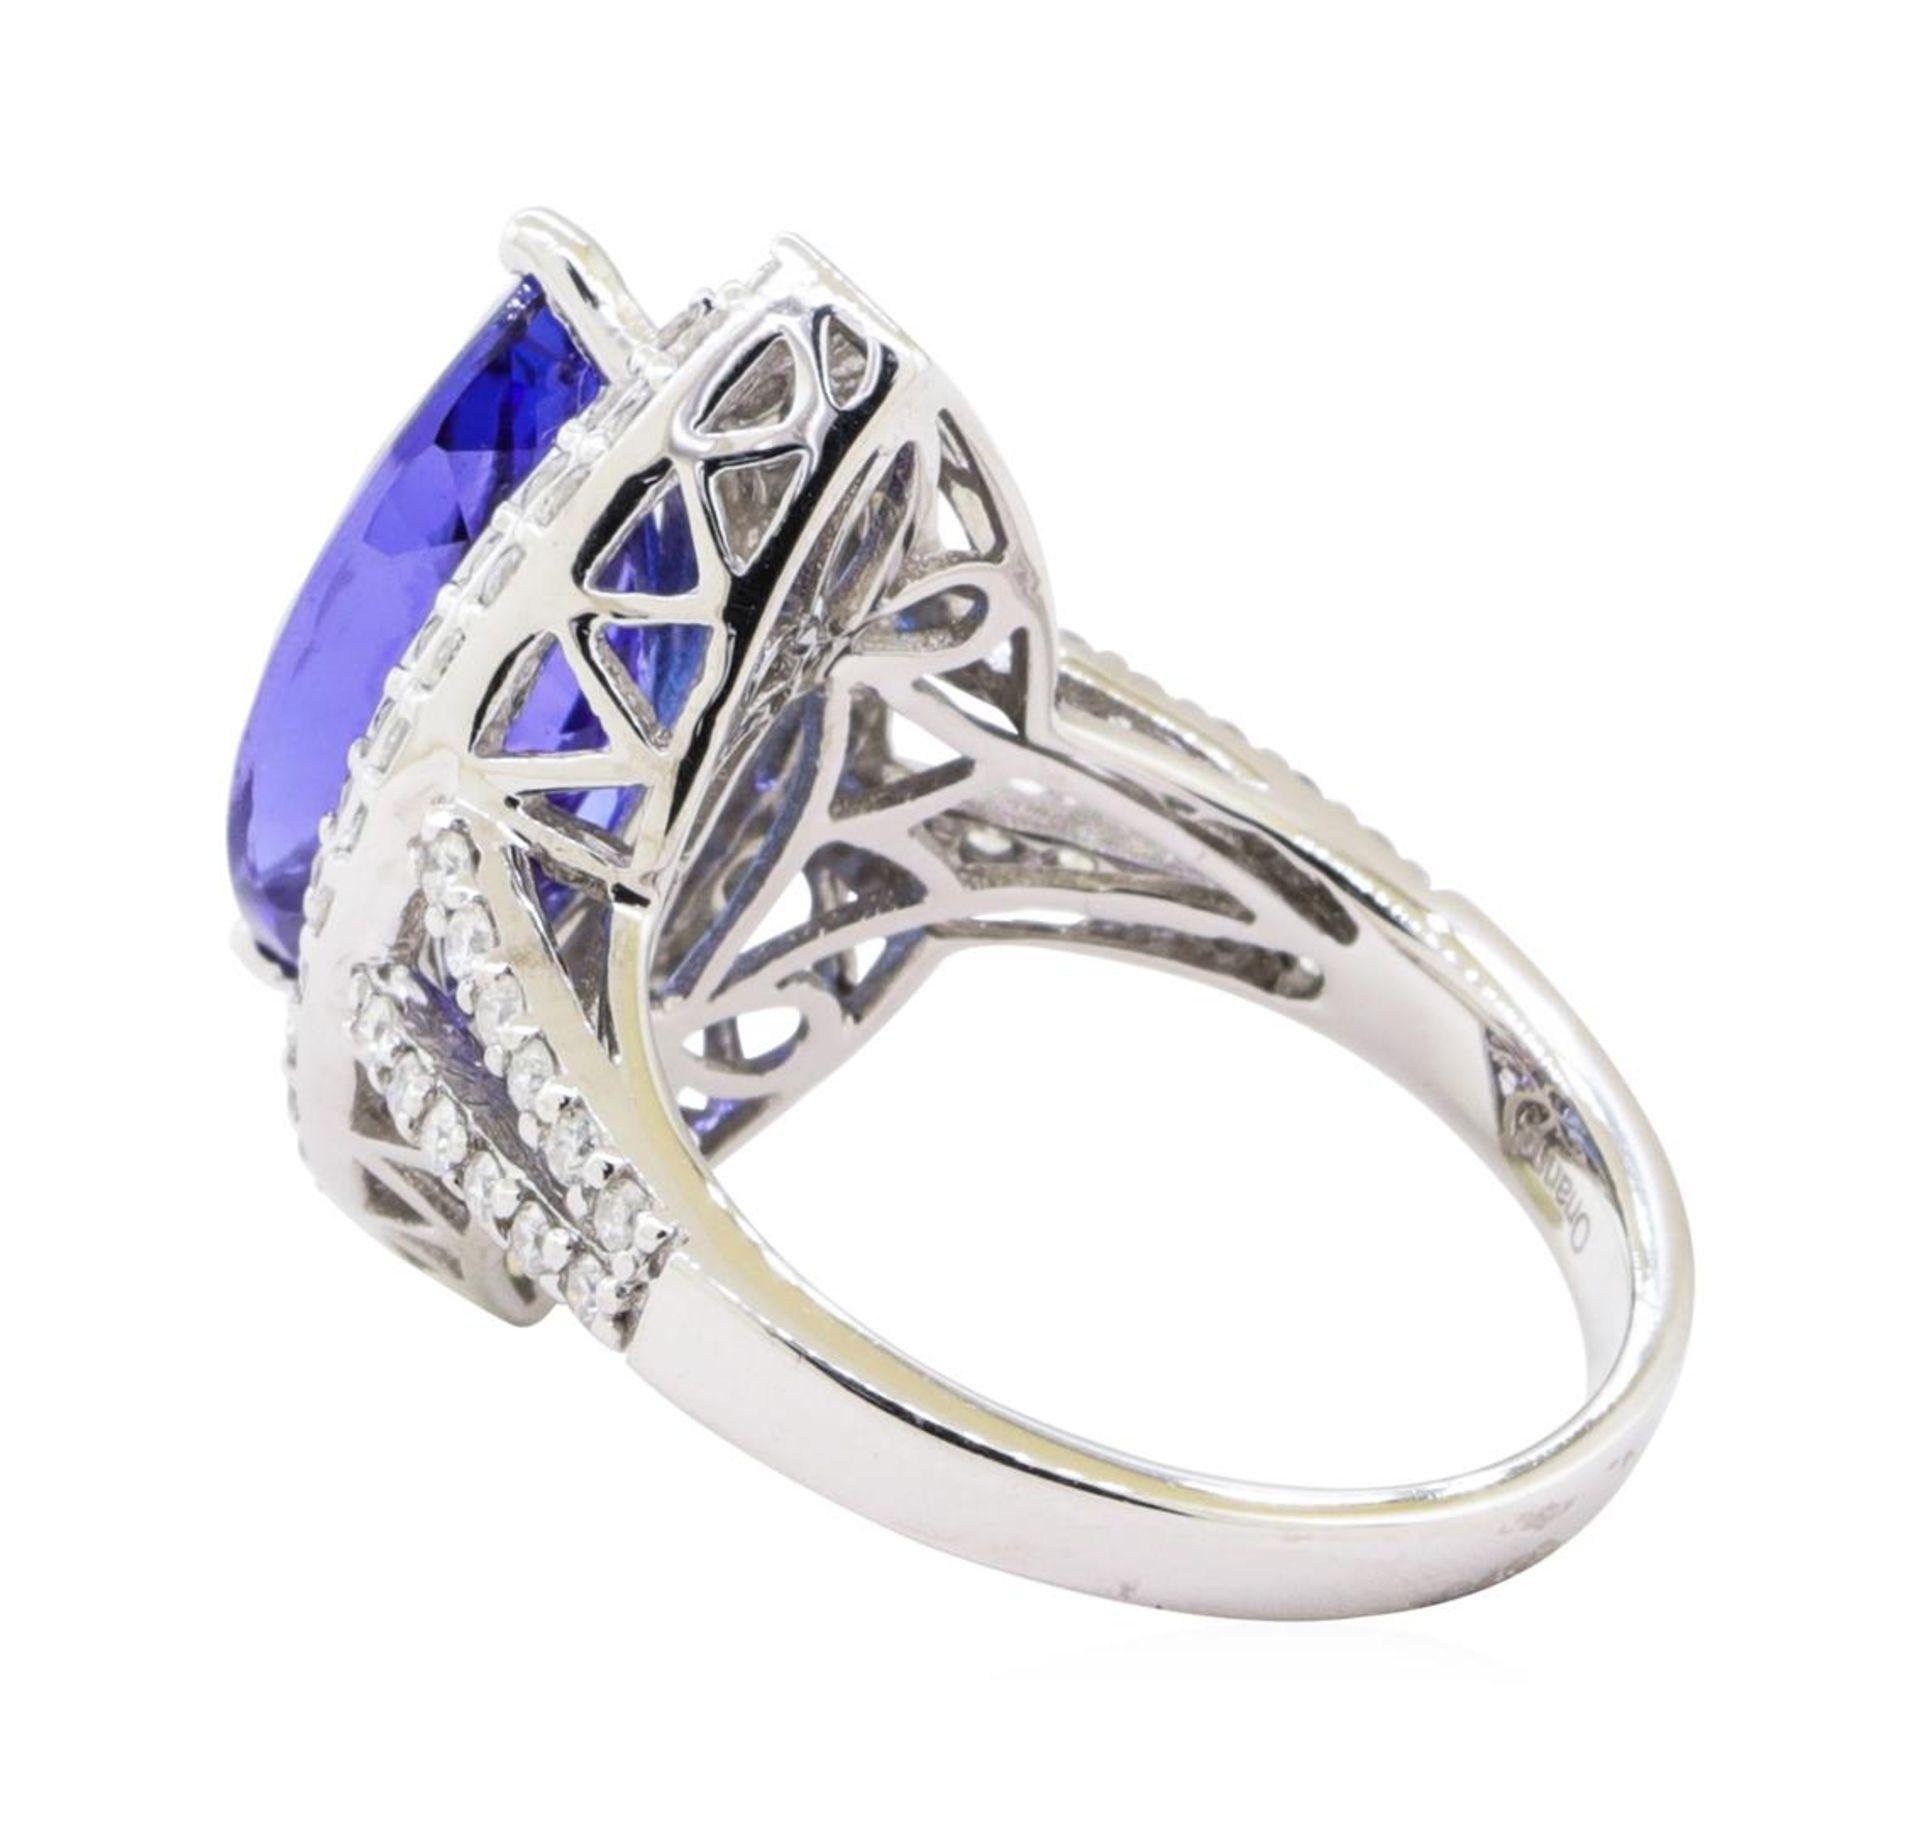 4.17ct Tanzanite and Diamond Ring - 14KT White Gold - Image 3 of 4